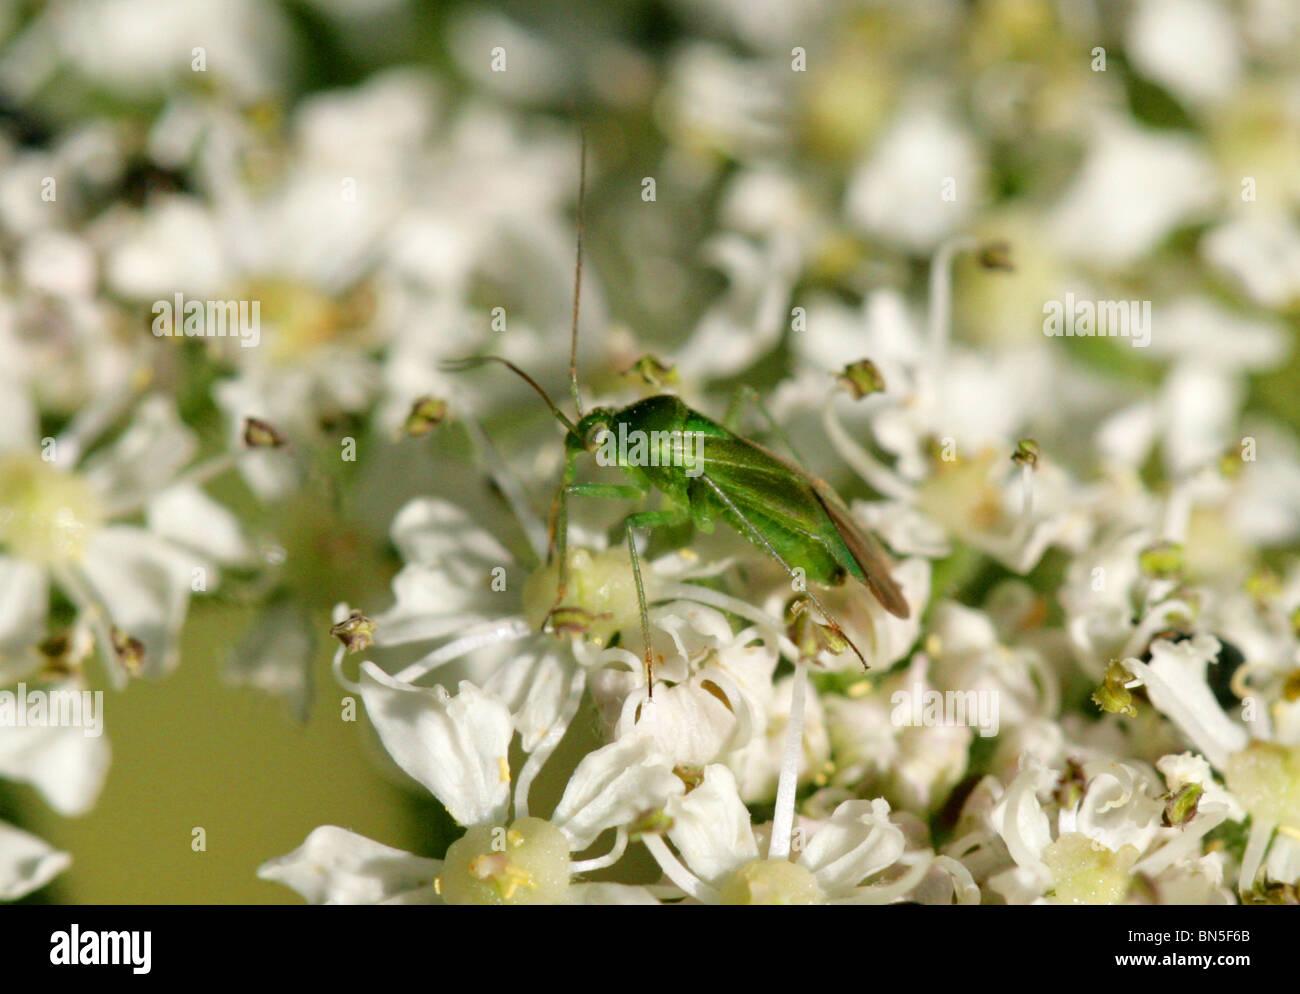 Common Green Capsid Bug, Lygocoris pabulinus, Miridae - Stock Image